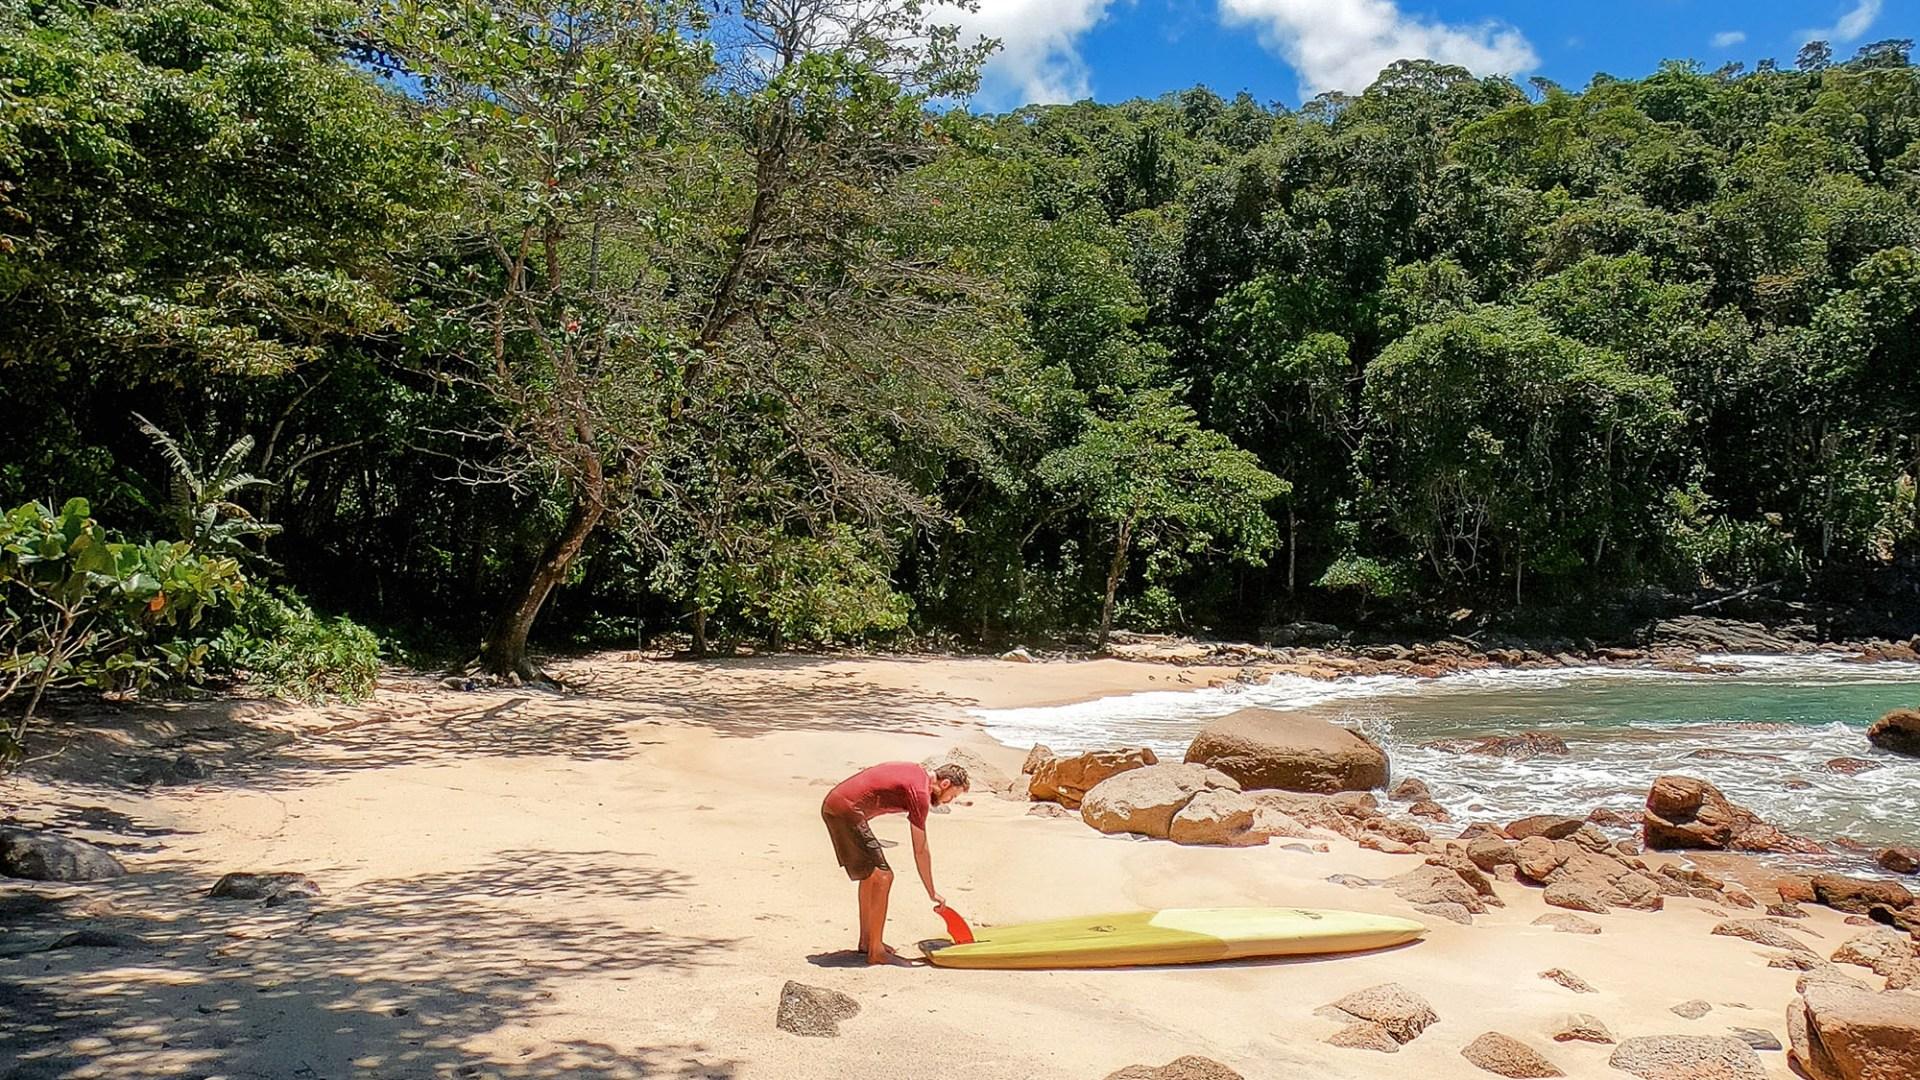 Maranduba, Quilombo, Mosteiro e Praia Deserta